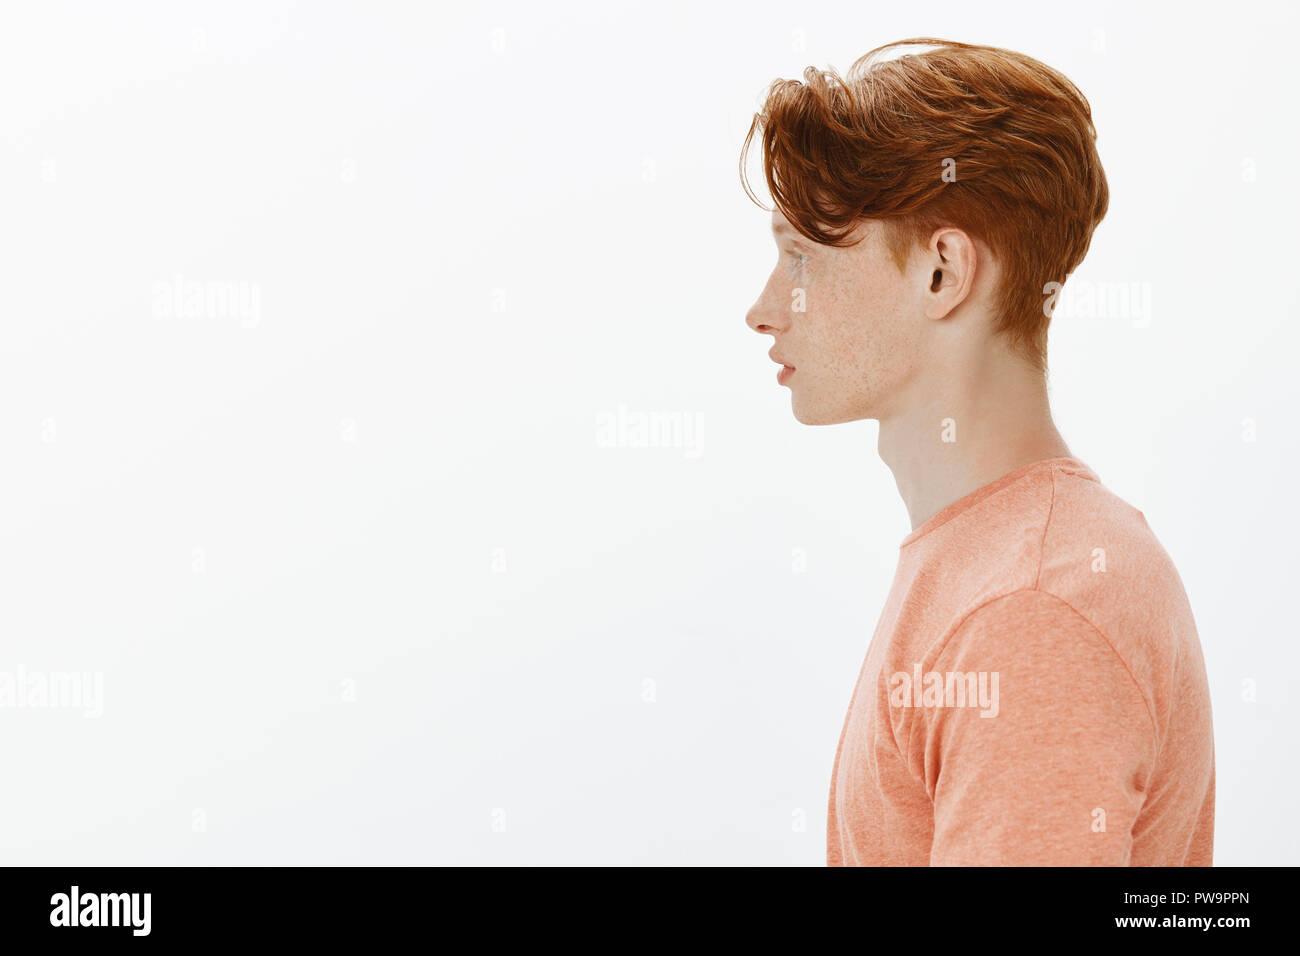 famous profile pics